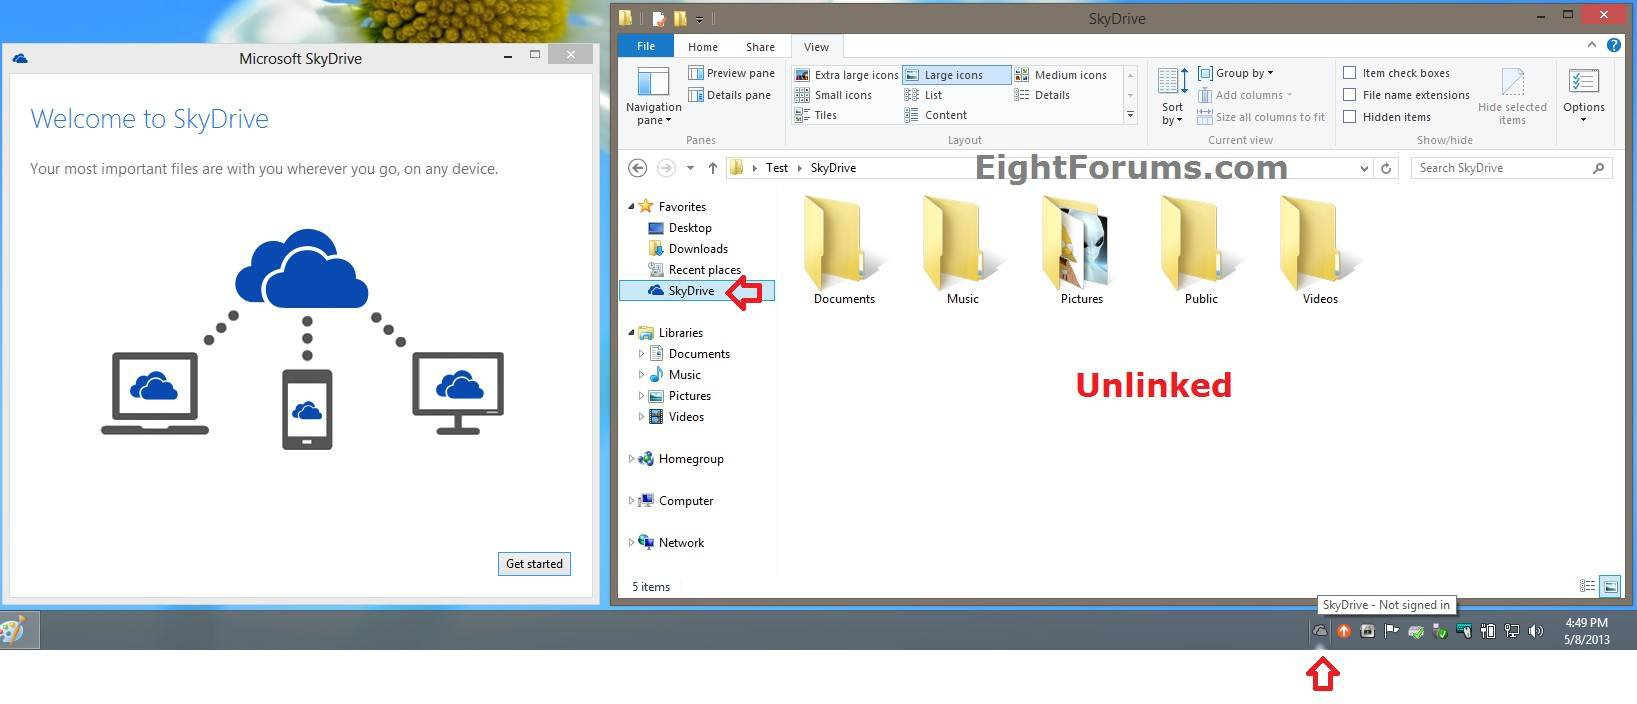 Unlinked_SkyDrive_Folder.jpg